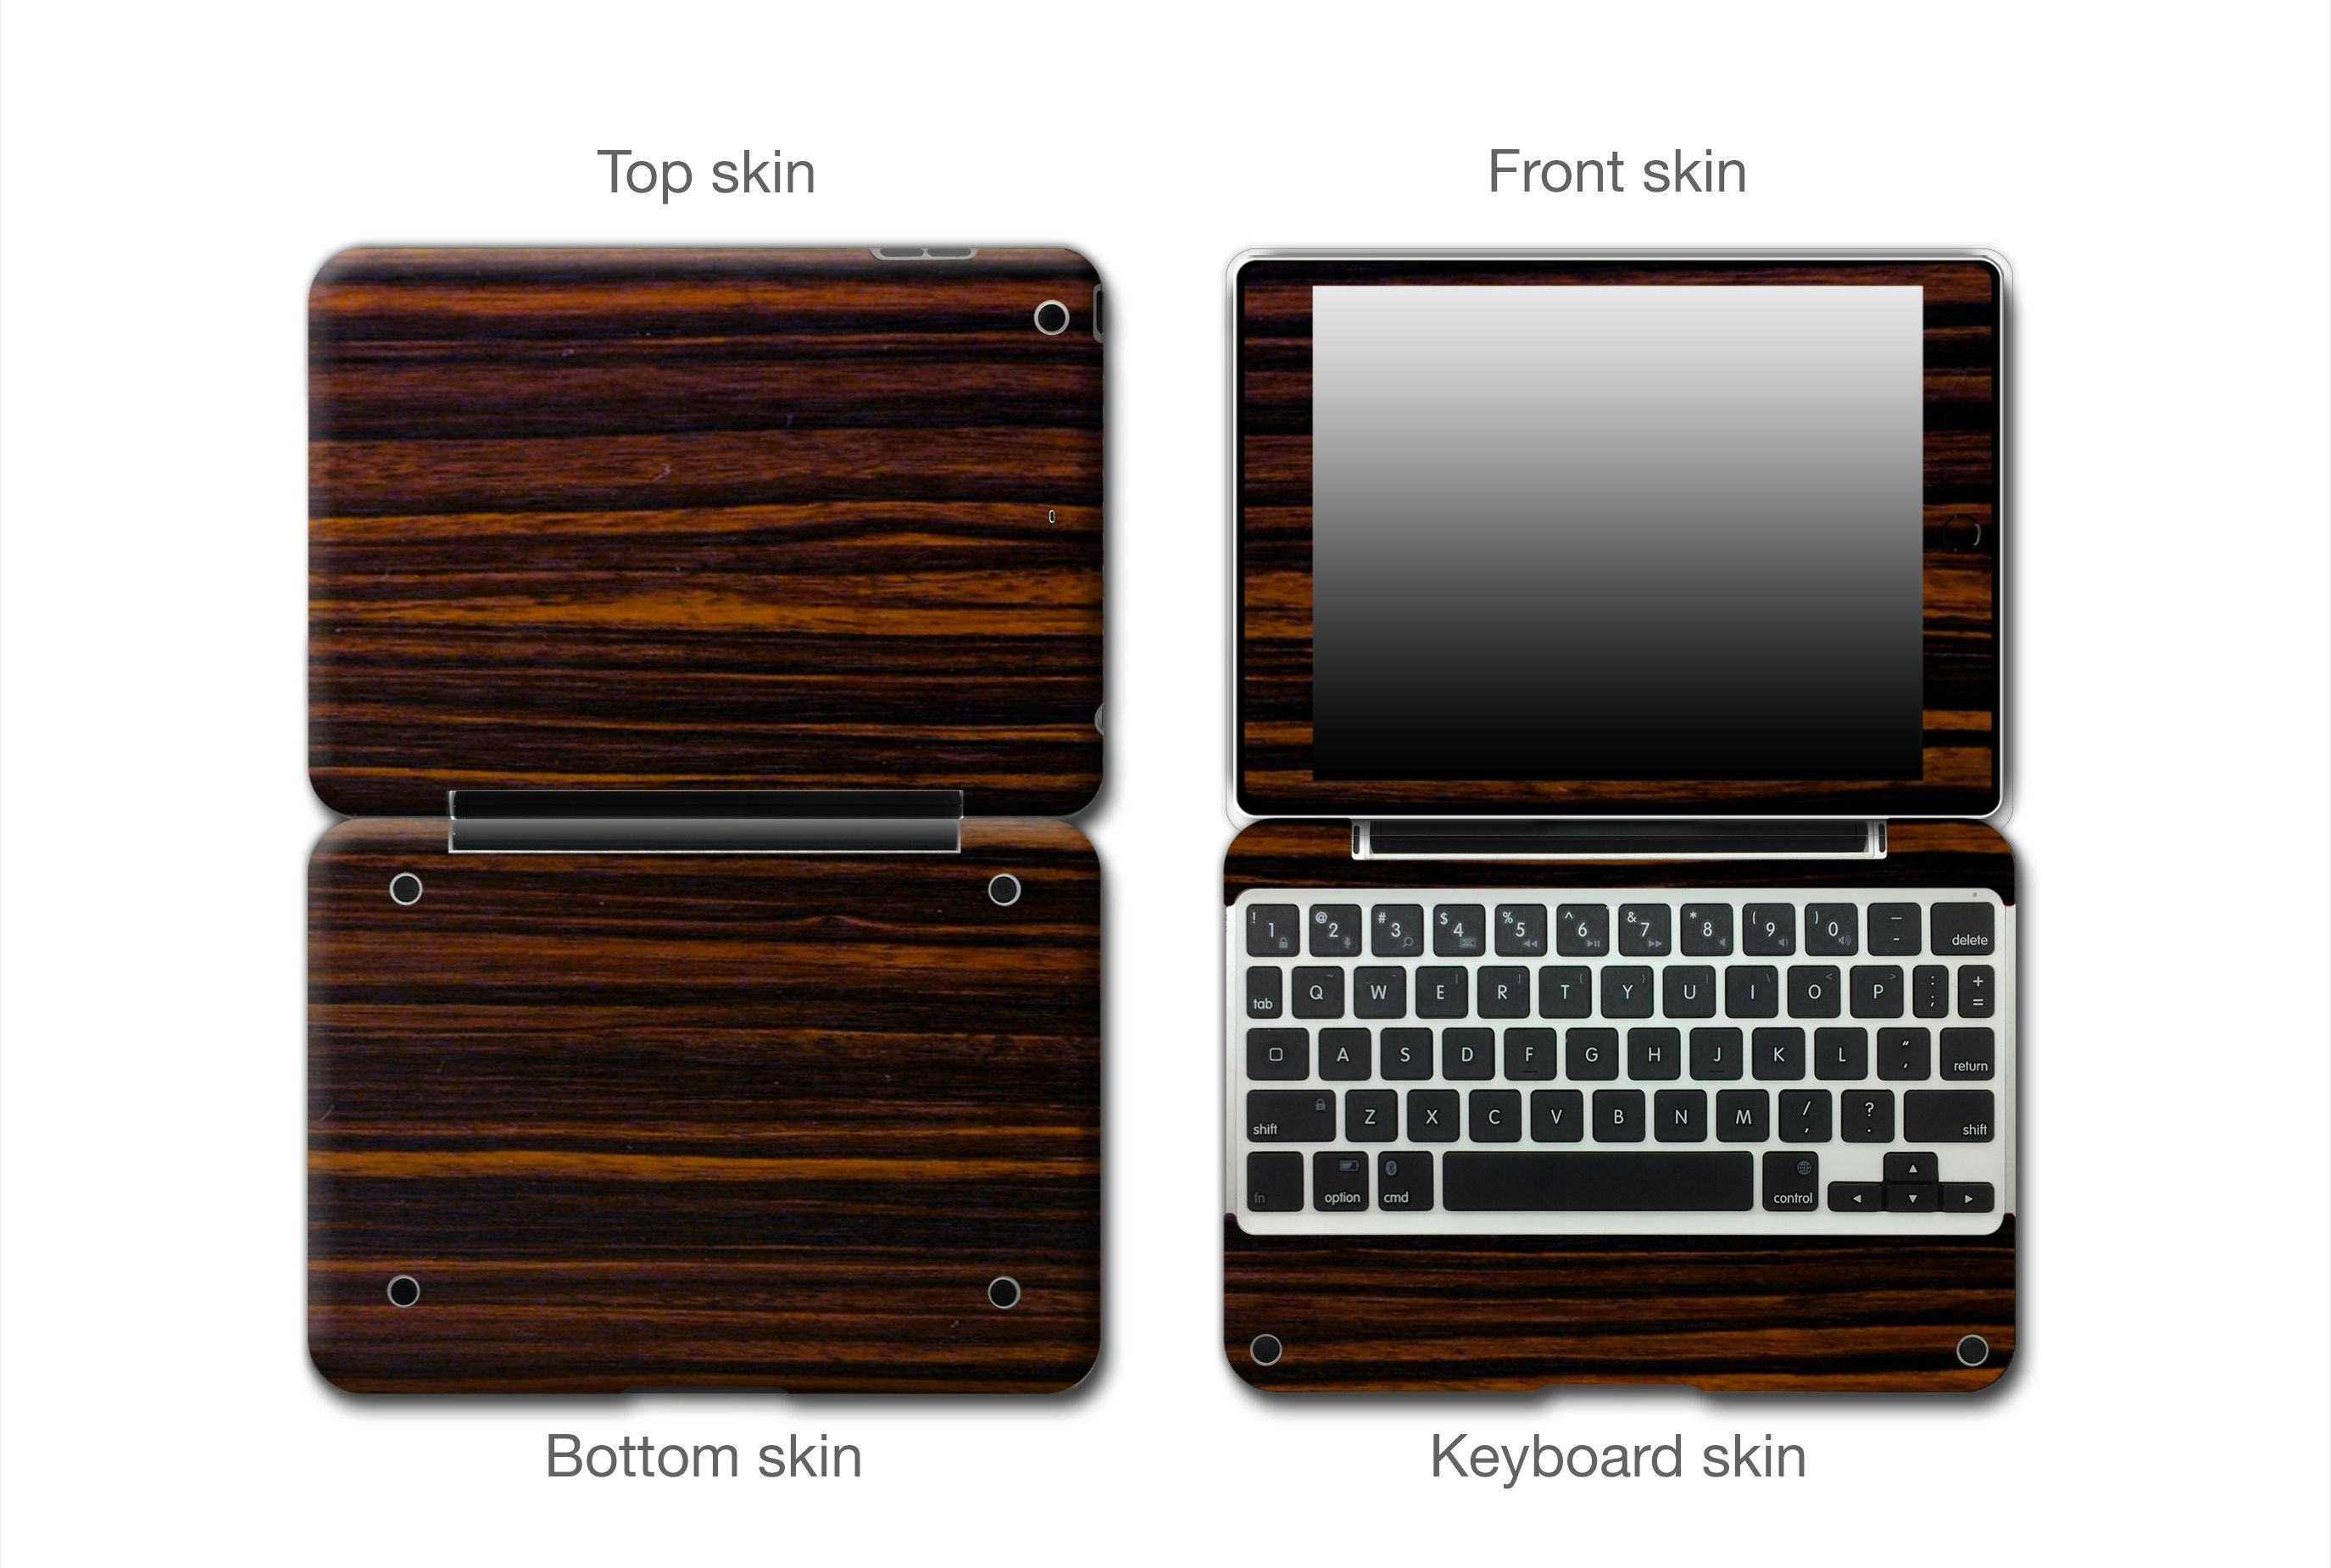 Ebony Wood #ClamCasePro #Pro #iPad #iPadMini #Apple #Tablet #Tablets #Computers #Keyboard #Gadget #Gadgets #Electronics #Electronic #Shield #Shields #Protector #Protectors #Decals #Skin #Skins #Wrap #Wraps #Vinyl #3M #Wood #Mahogany #Ebony #Kyrobe #Persimmon #Walnut